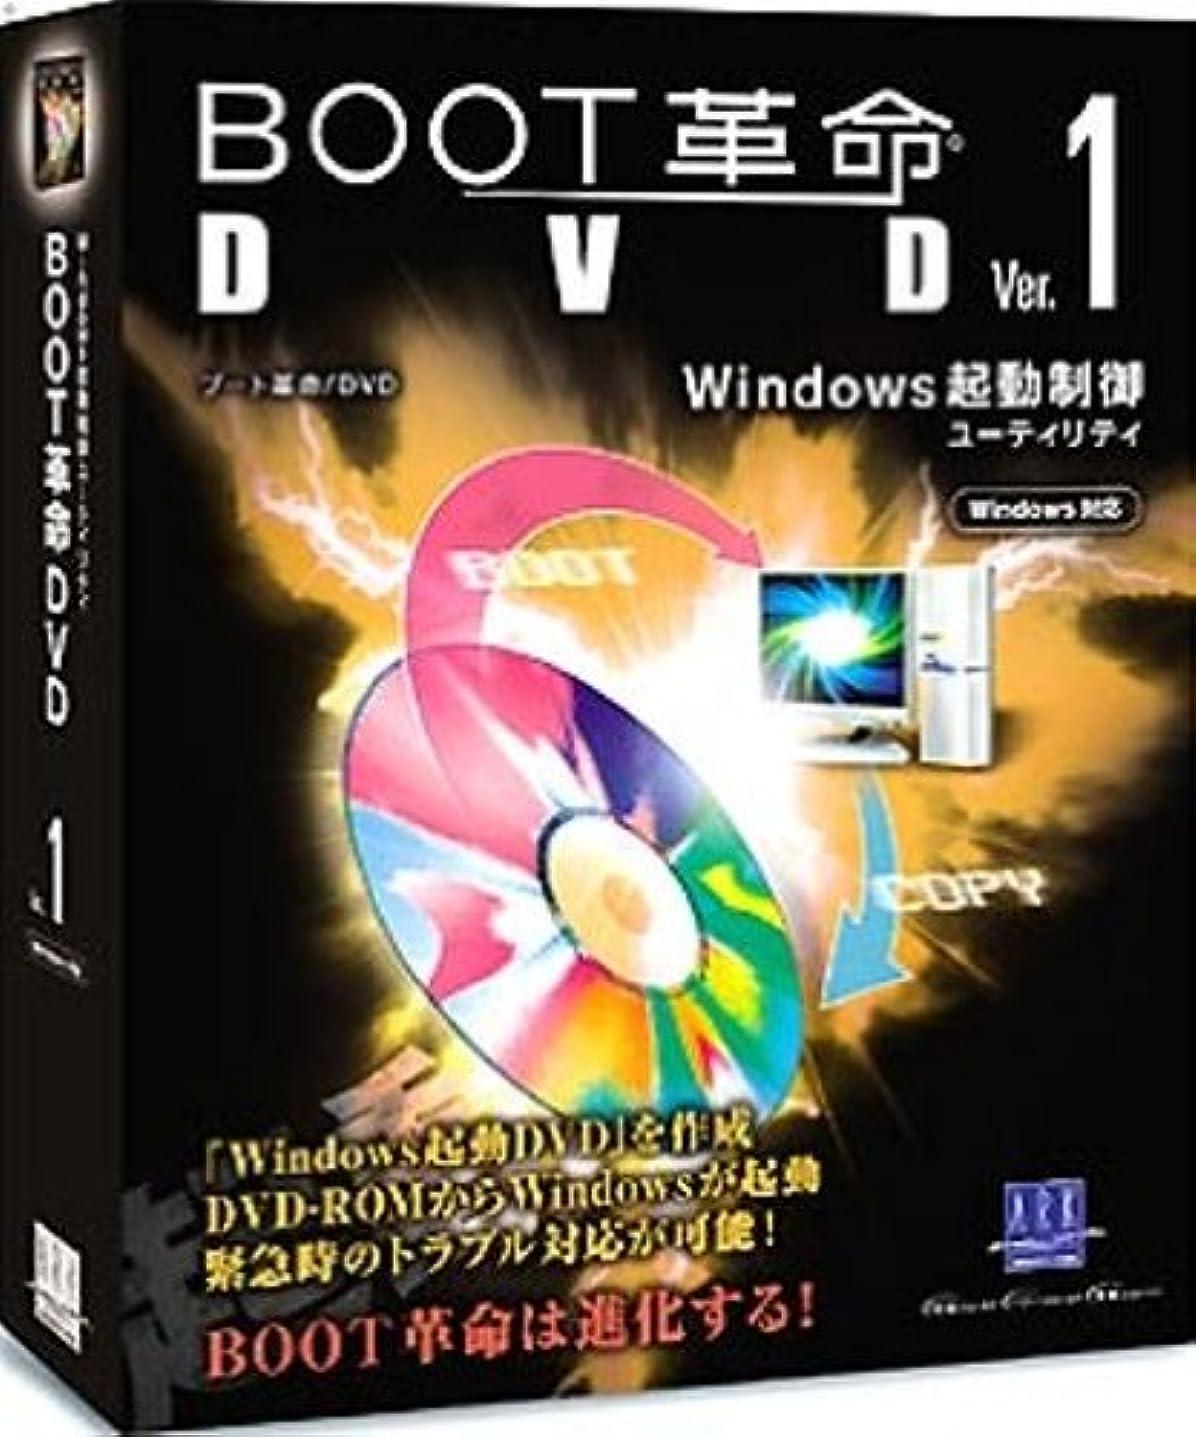 BOOT革命/DVD Ver.1 ライセンスパック25ユーザー